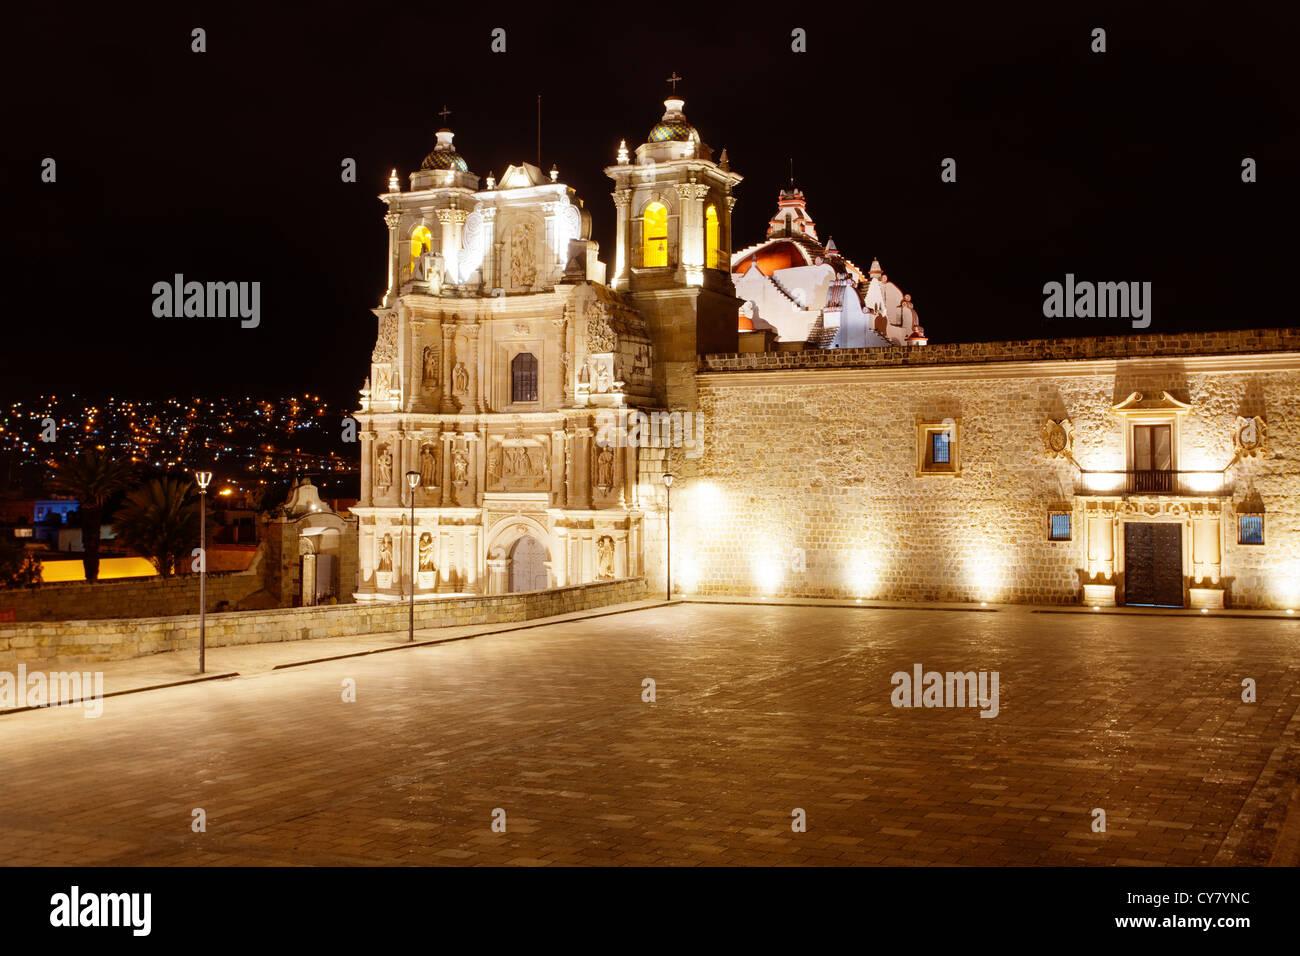 Night view of the illuminated Basilica de Nuestra Señora de la Ascension in Oaxaca, Mexico. - Stock Image